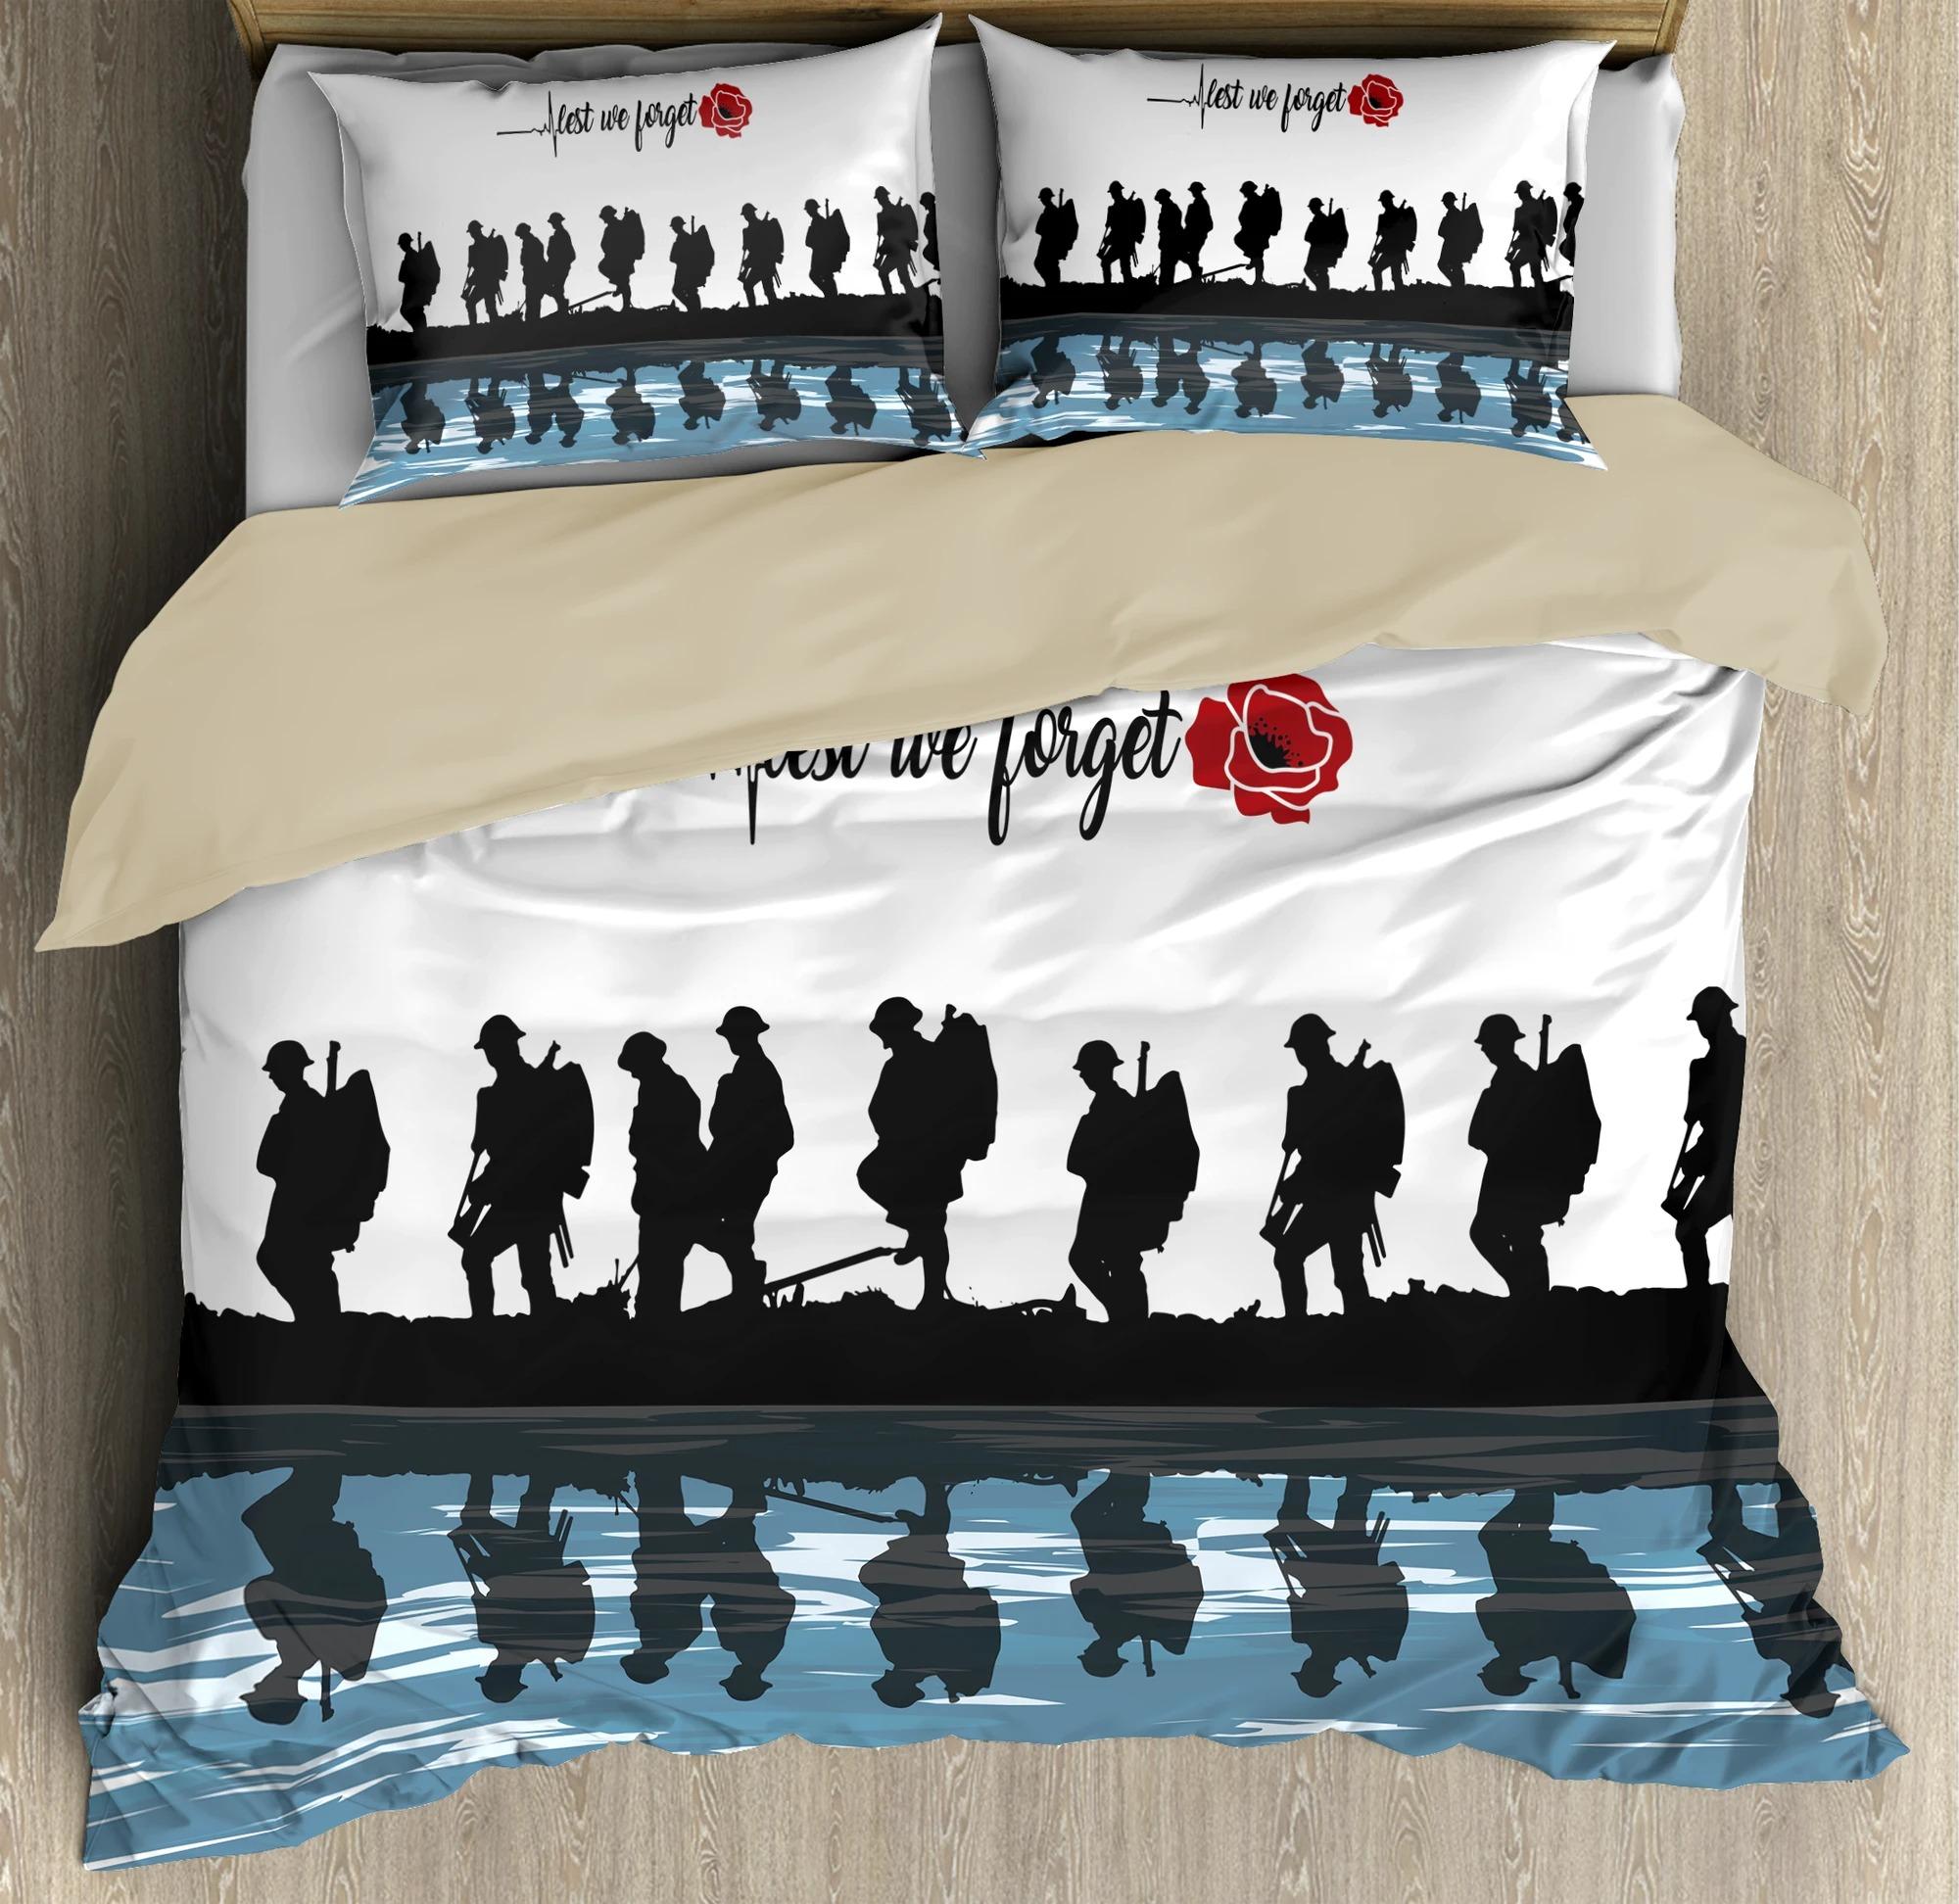 Lest we forget Honor the fallen UK Veteran 3D bedding set4